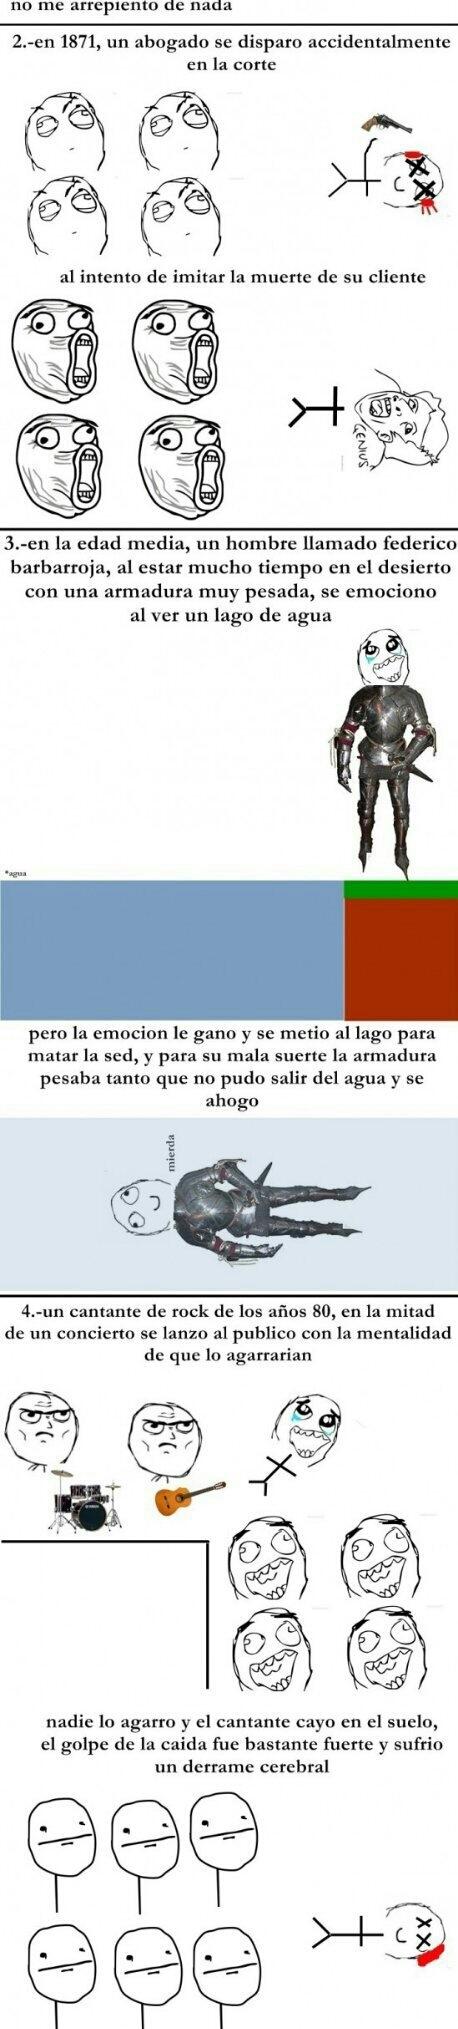 Fails - meme